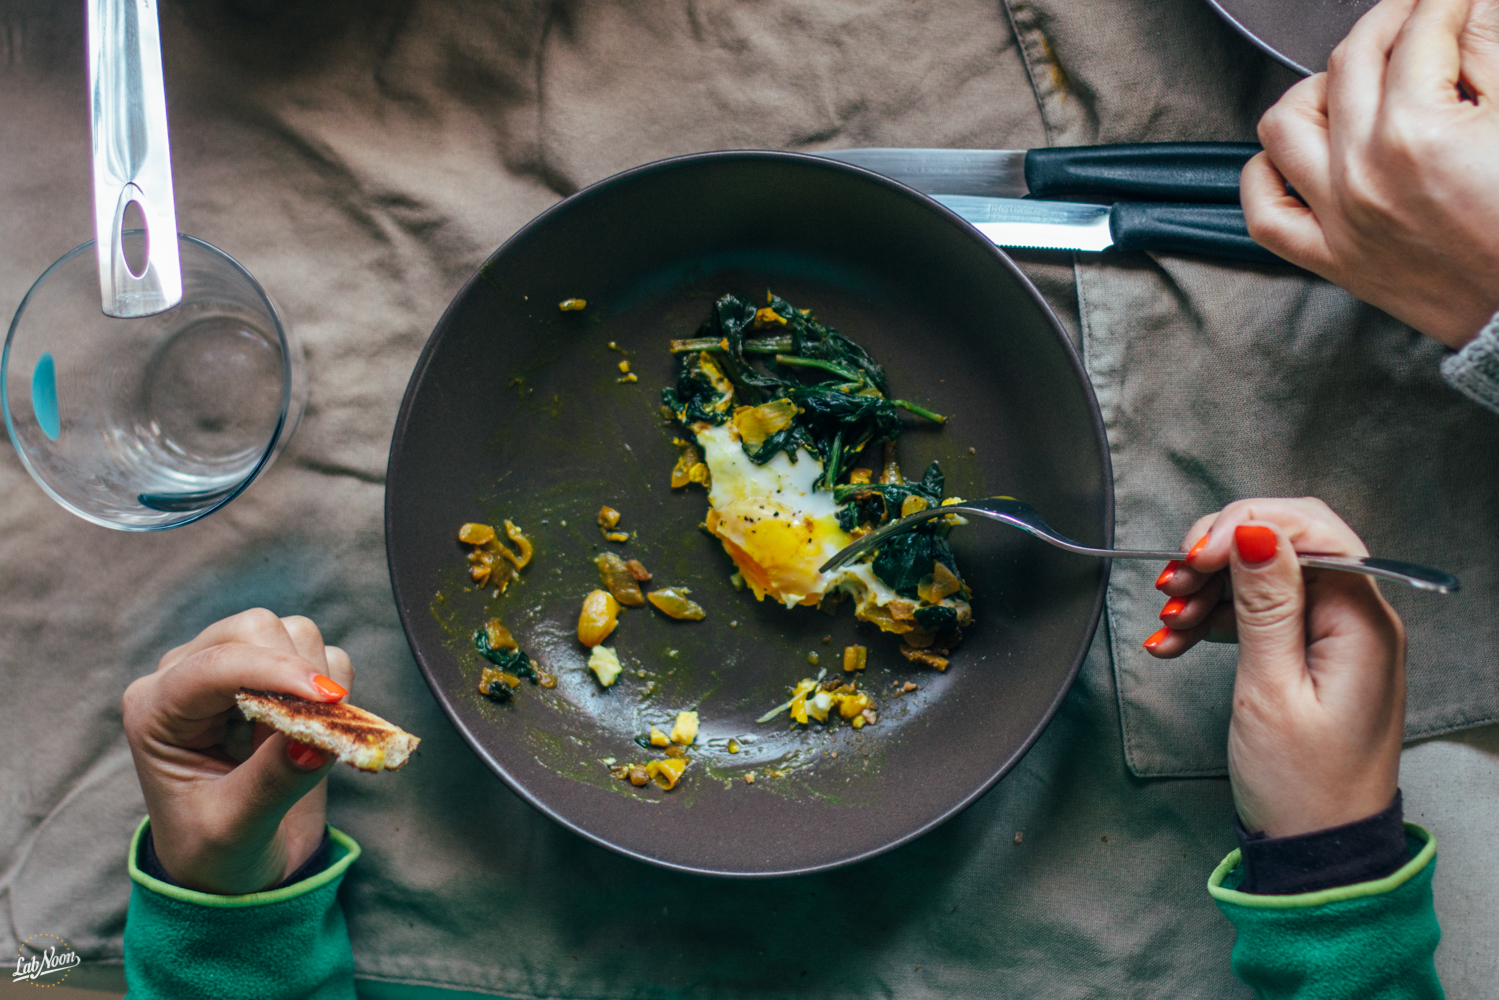 Narcissus, Persian Spinach and Eggs (Nargessi) | Narciso, Uova e Spinaci alla Persiana | Lab Noon